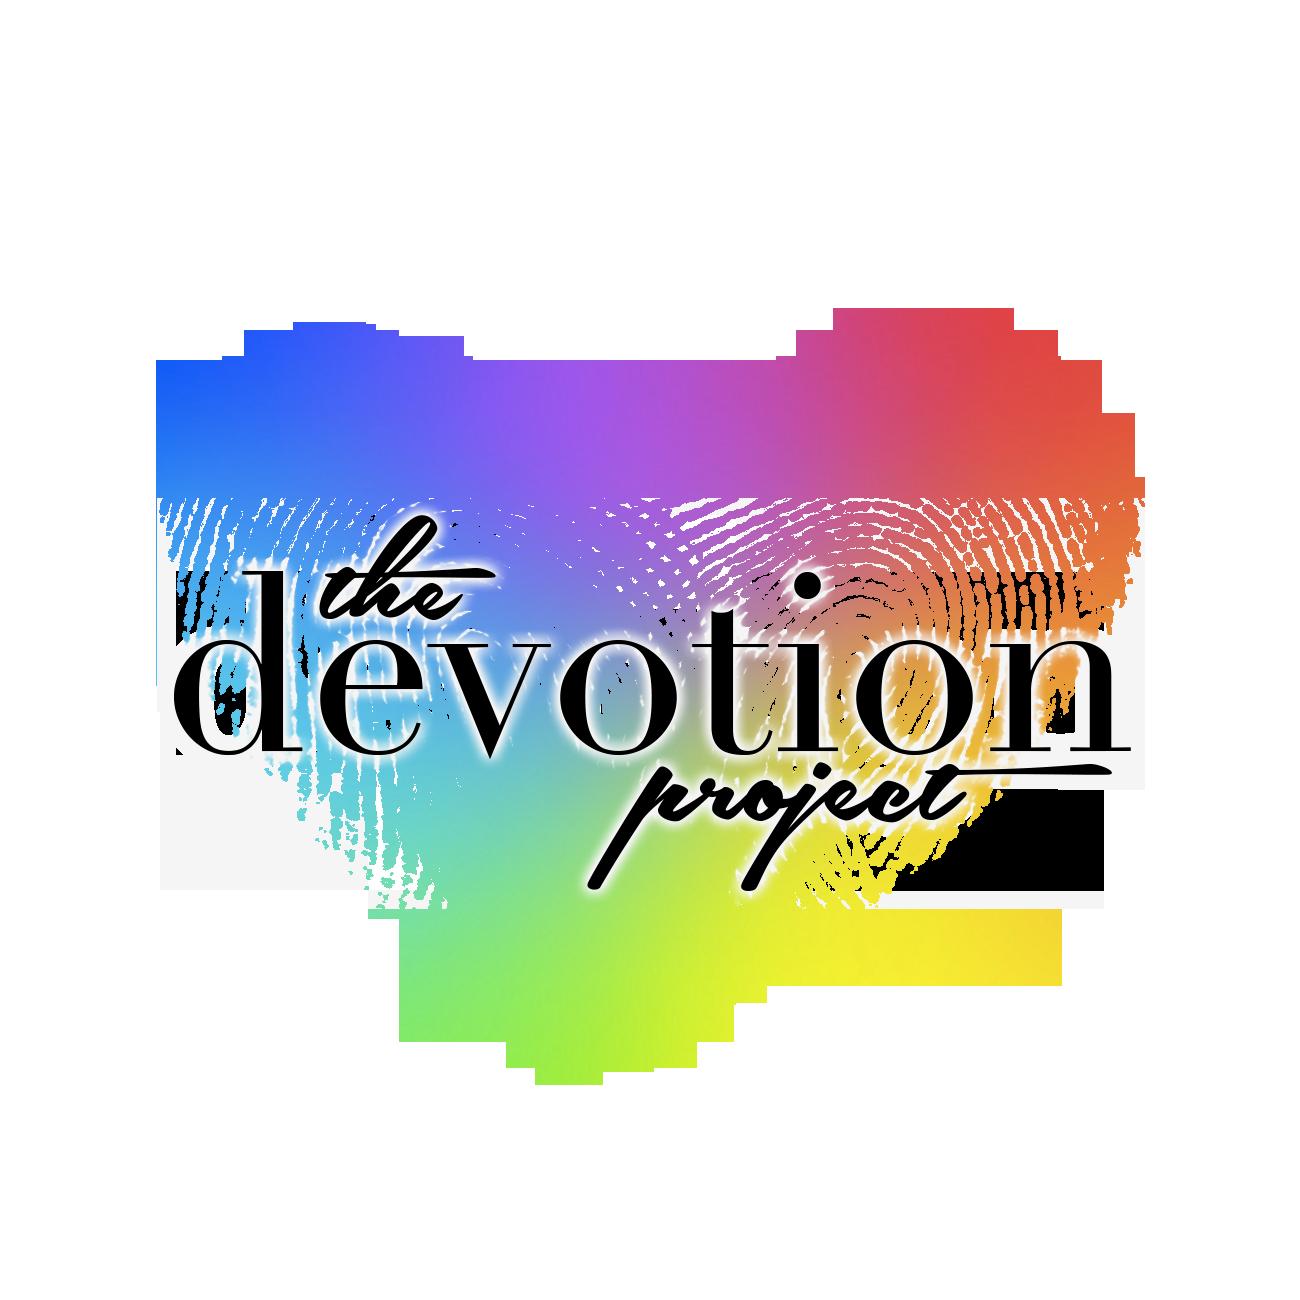 Devotion Heart (Transparent BG) lockup65.png